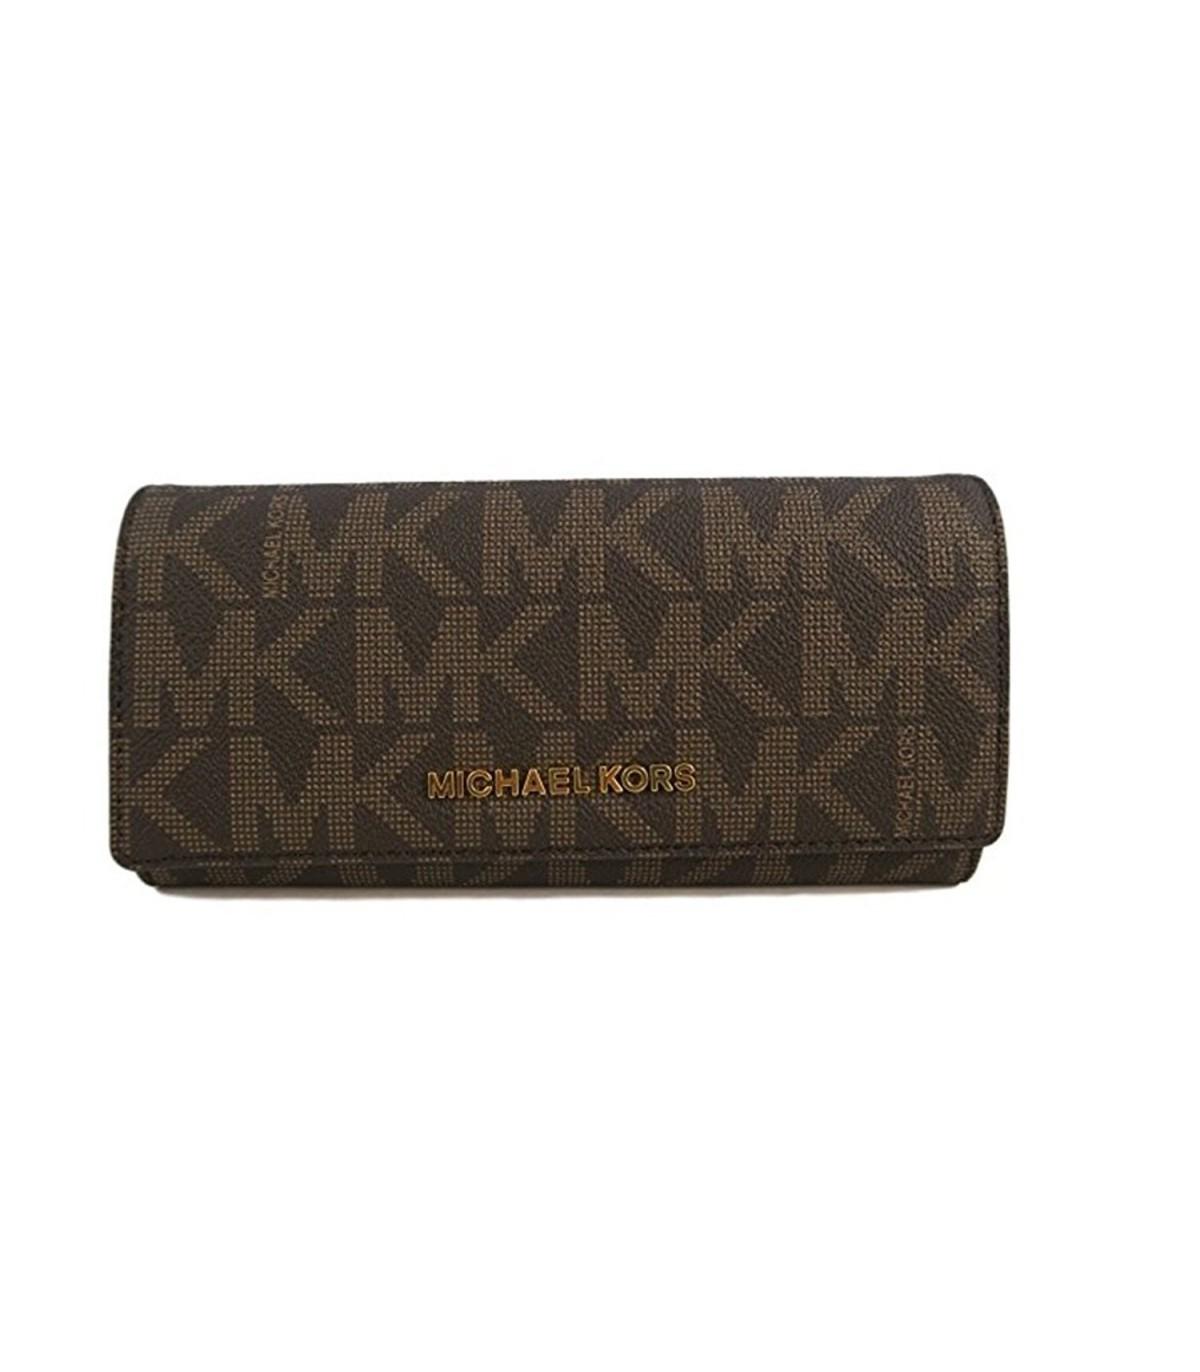 7e60f0374164 Michael Kors Jet Set Travel PVC Signature Carryall LTR Clutch Wallet in  Brown